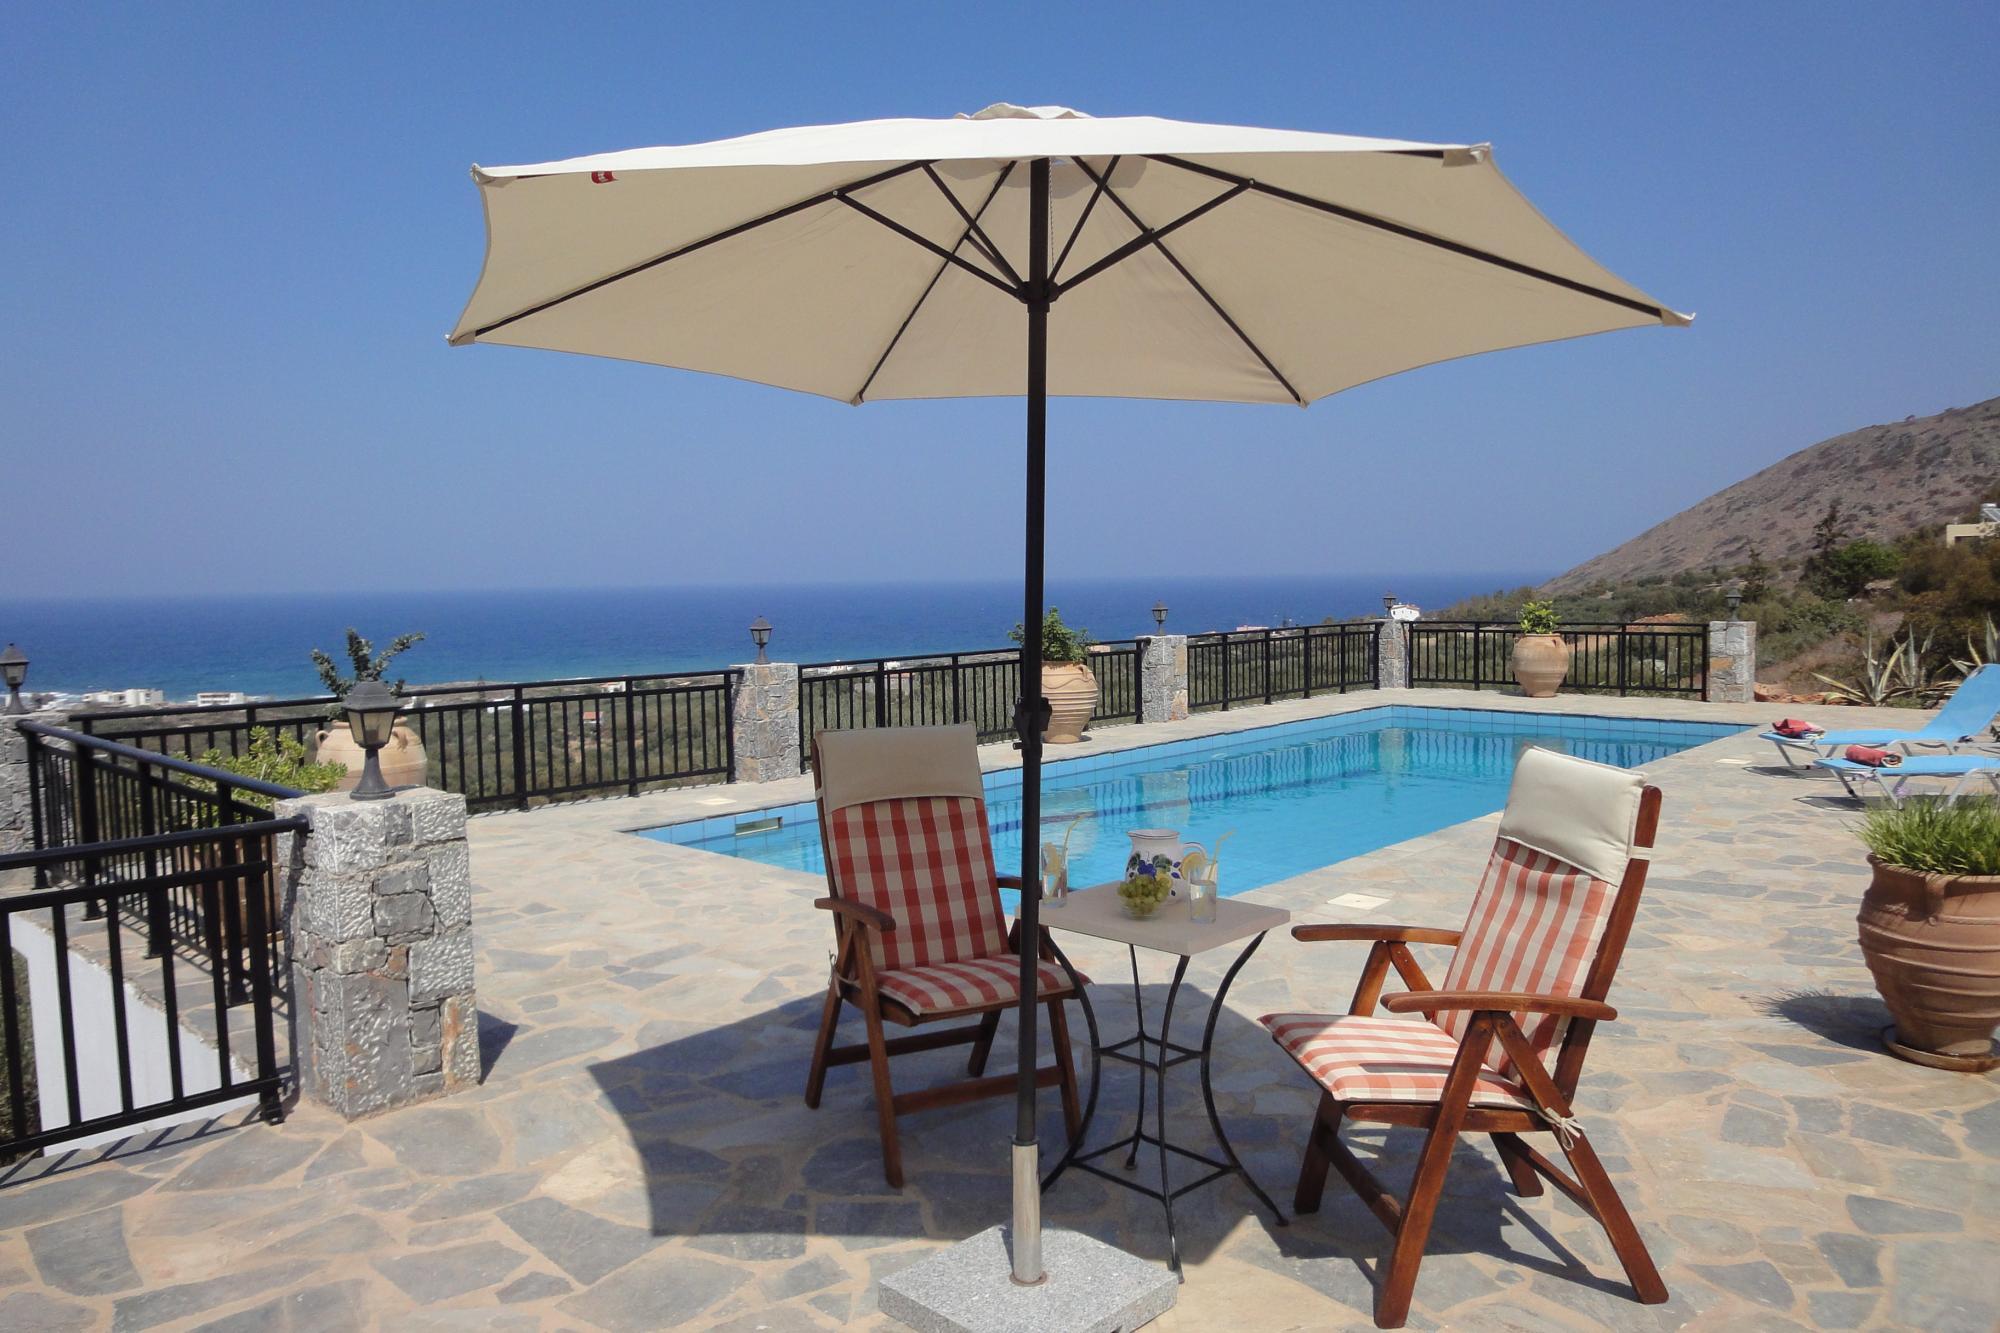 Modern, spacious 3 bedroom villa with beautiful uninterrupted sea views